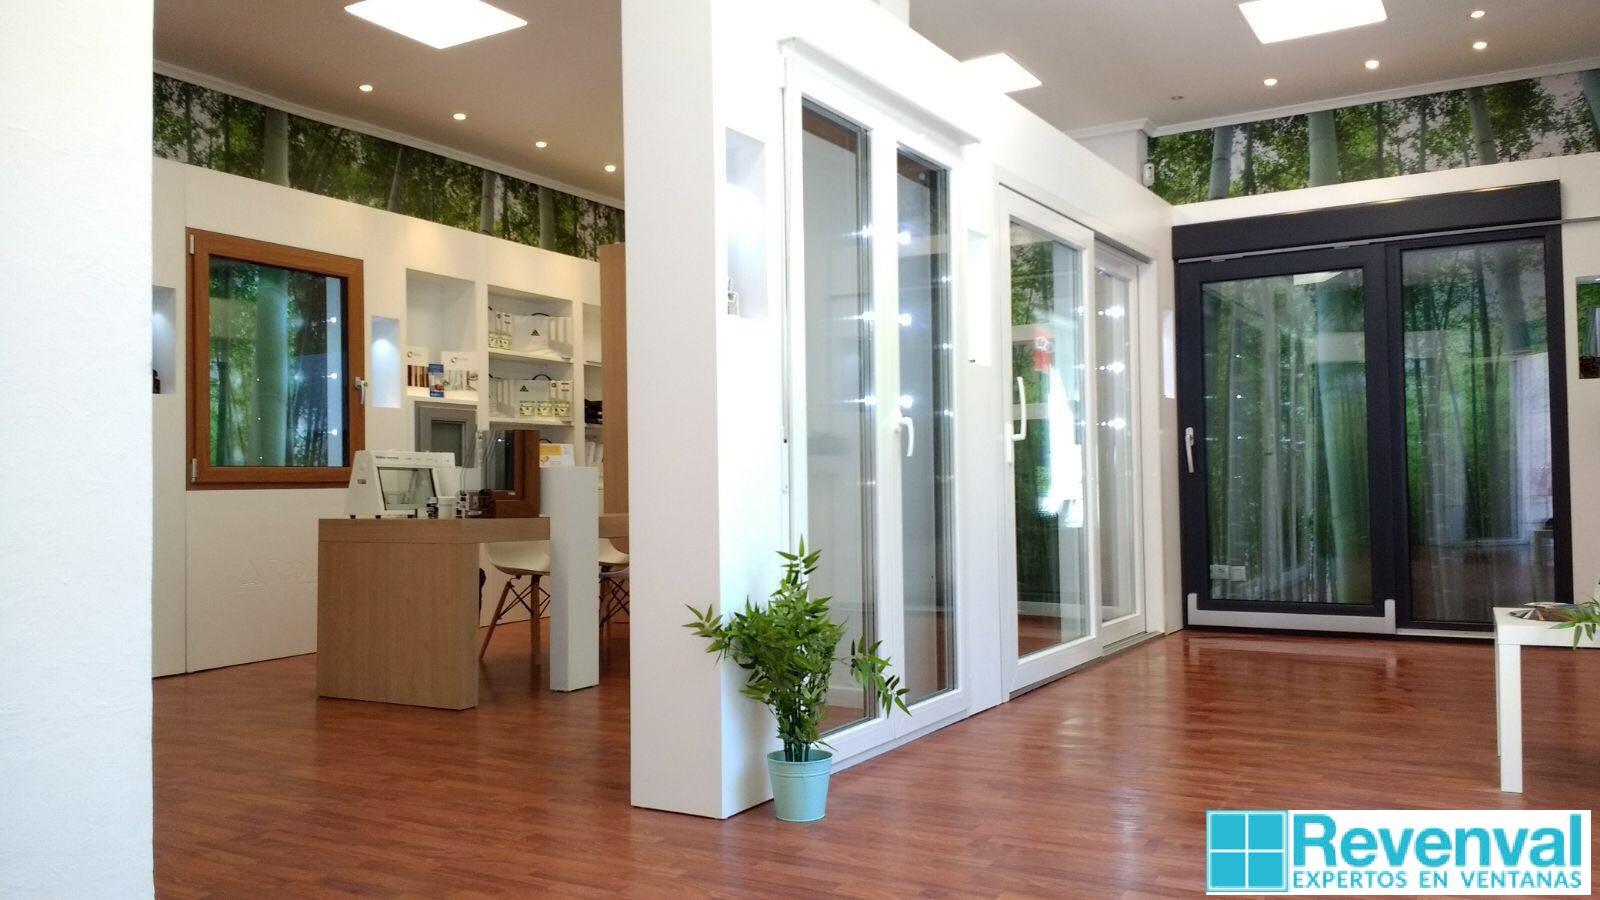 Revenval ventanas inaugura nueva tienda en Valencia - Revenval